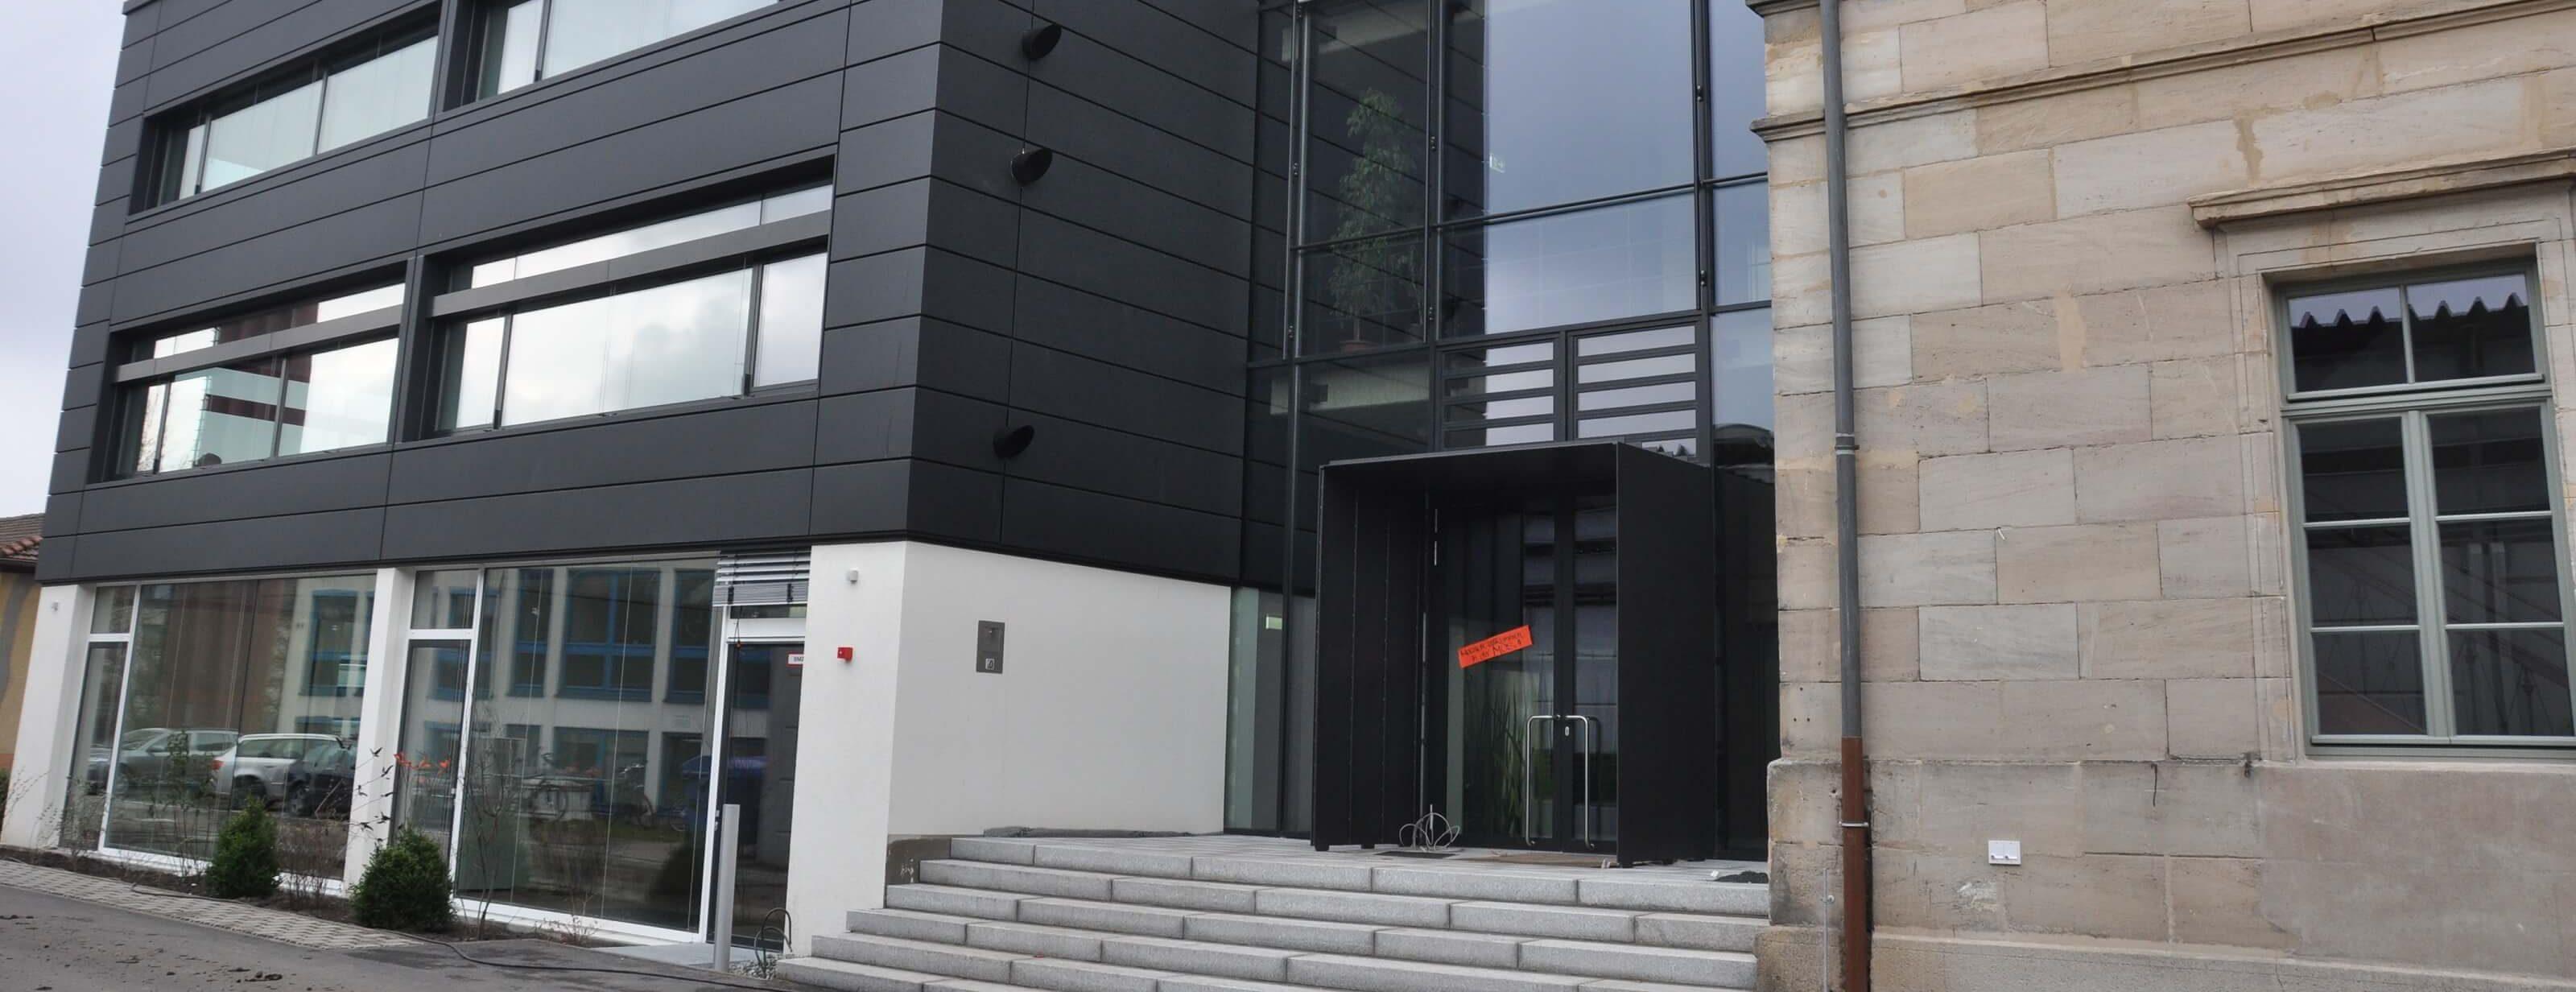 MOS-Gebäude in Nürnberg